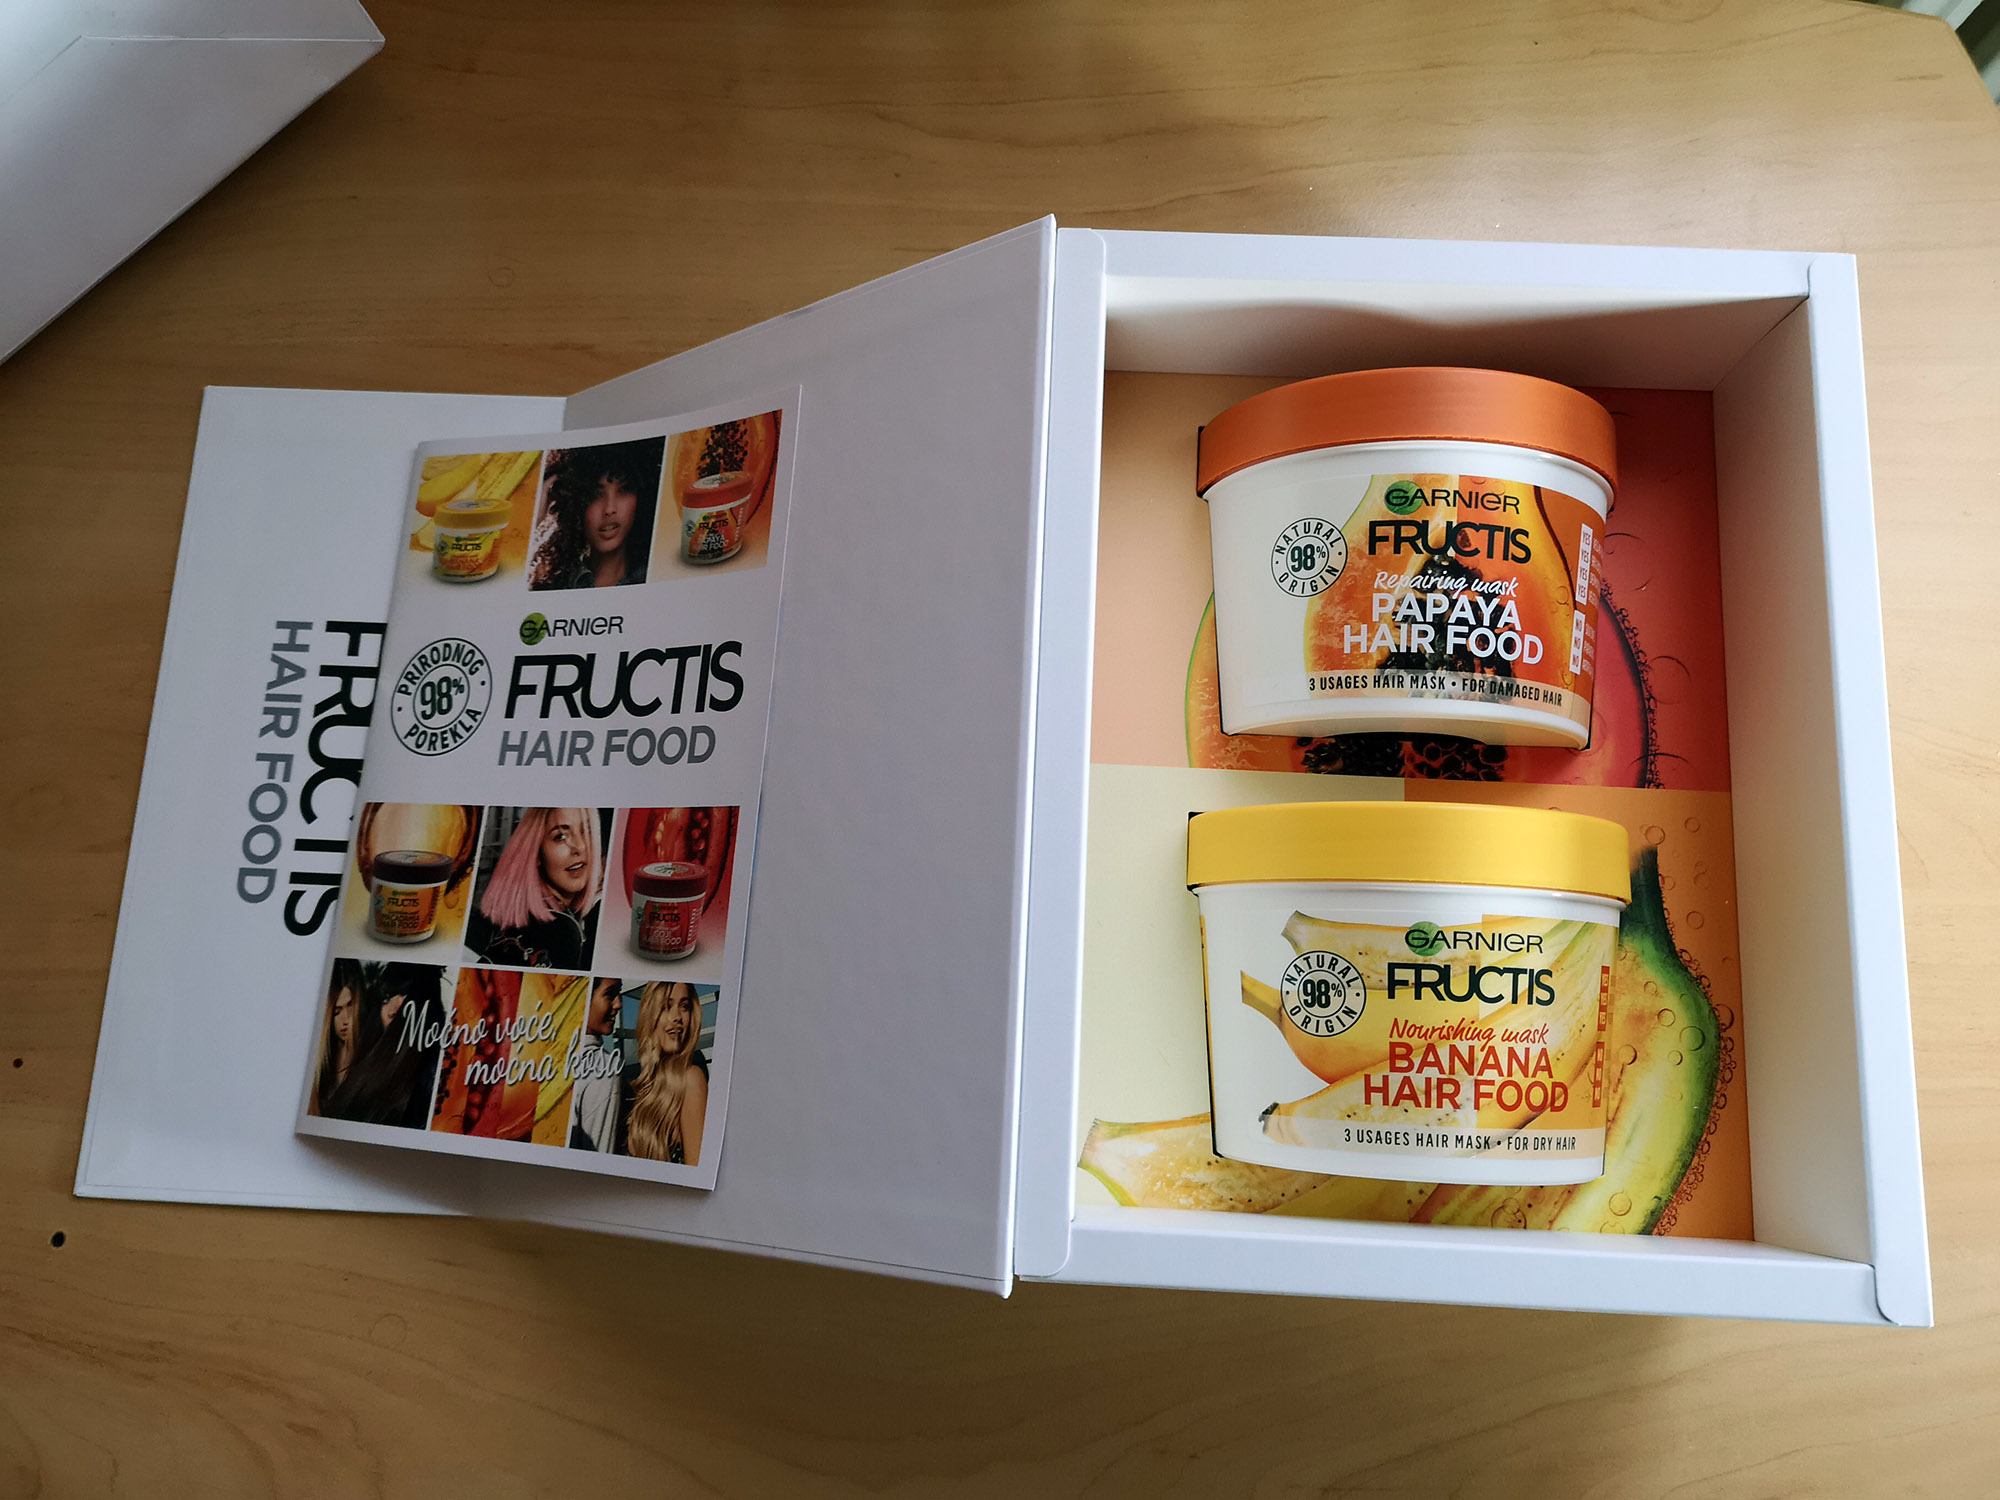 Garnier Fructis Hair Food Papaja i Banana; Foto: kovalska.rs